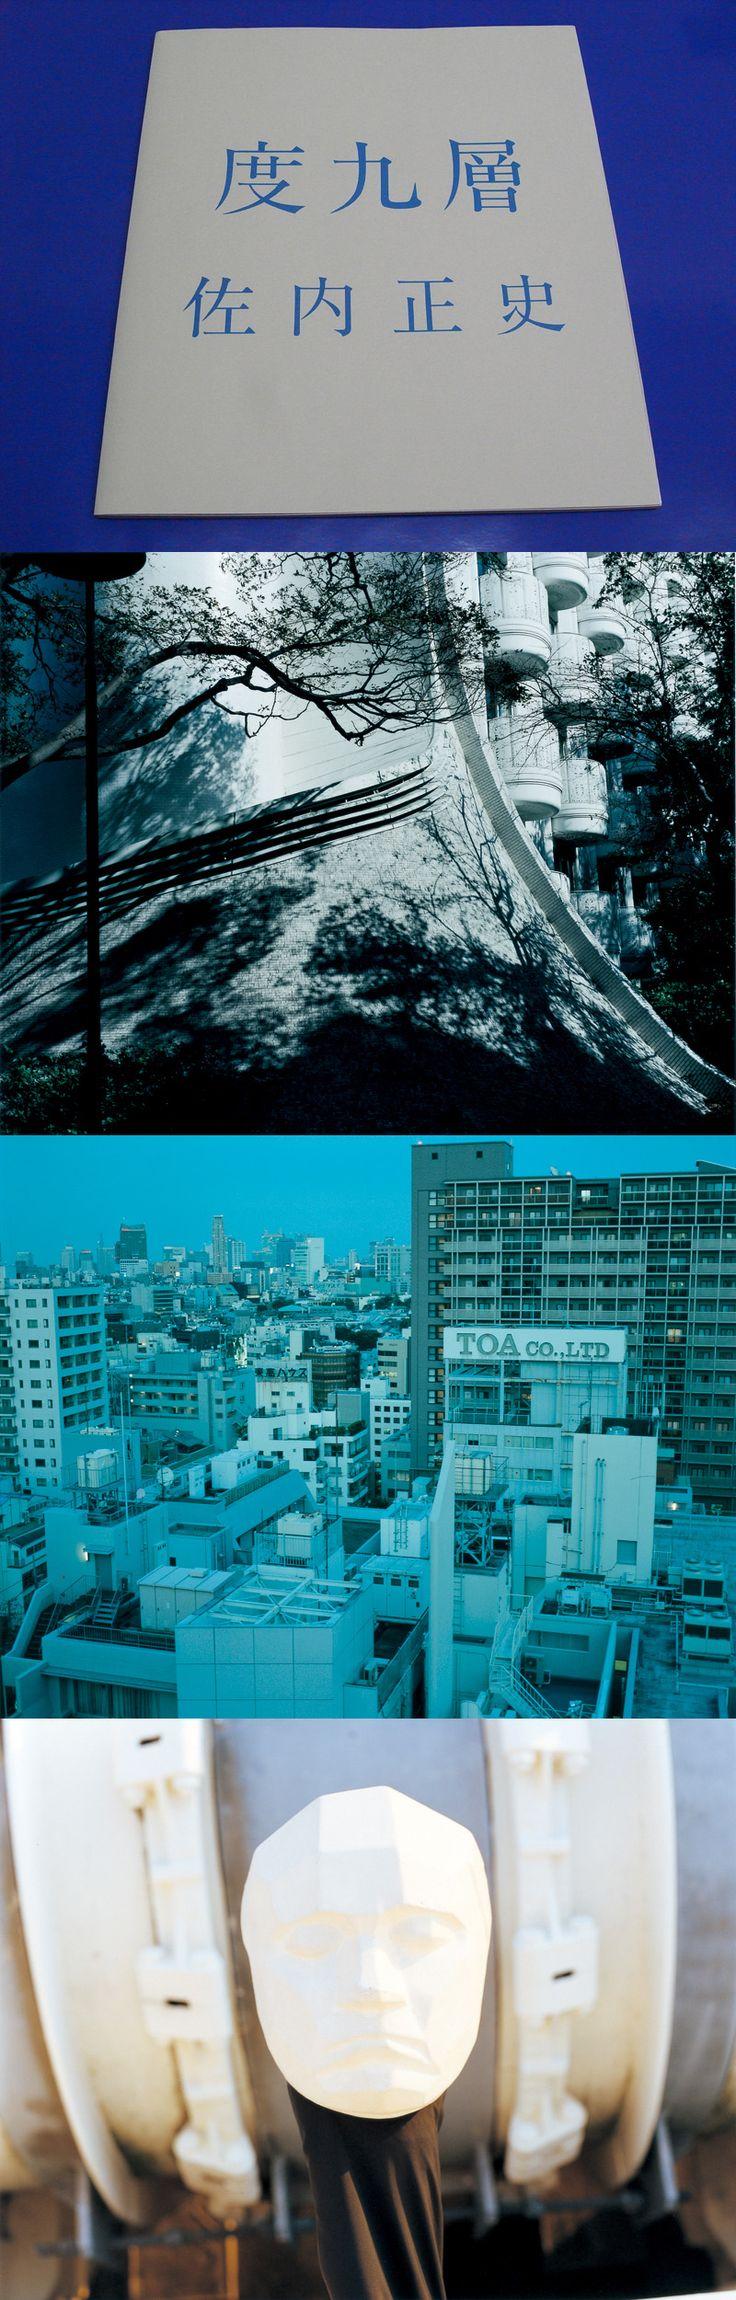 Masafumi Sanai(佐内正史)『度九層』対照(2012)